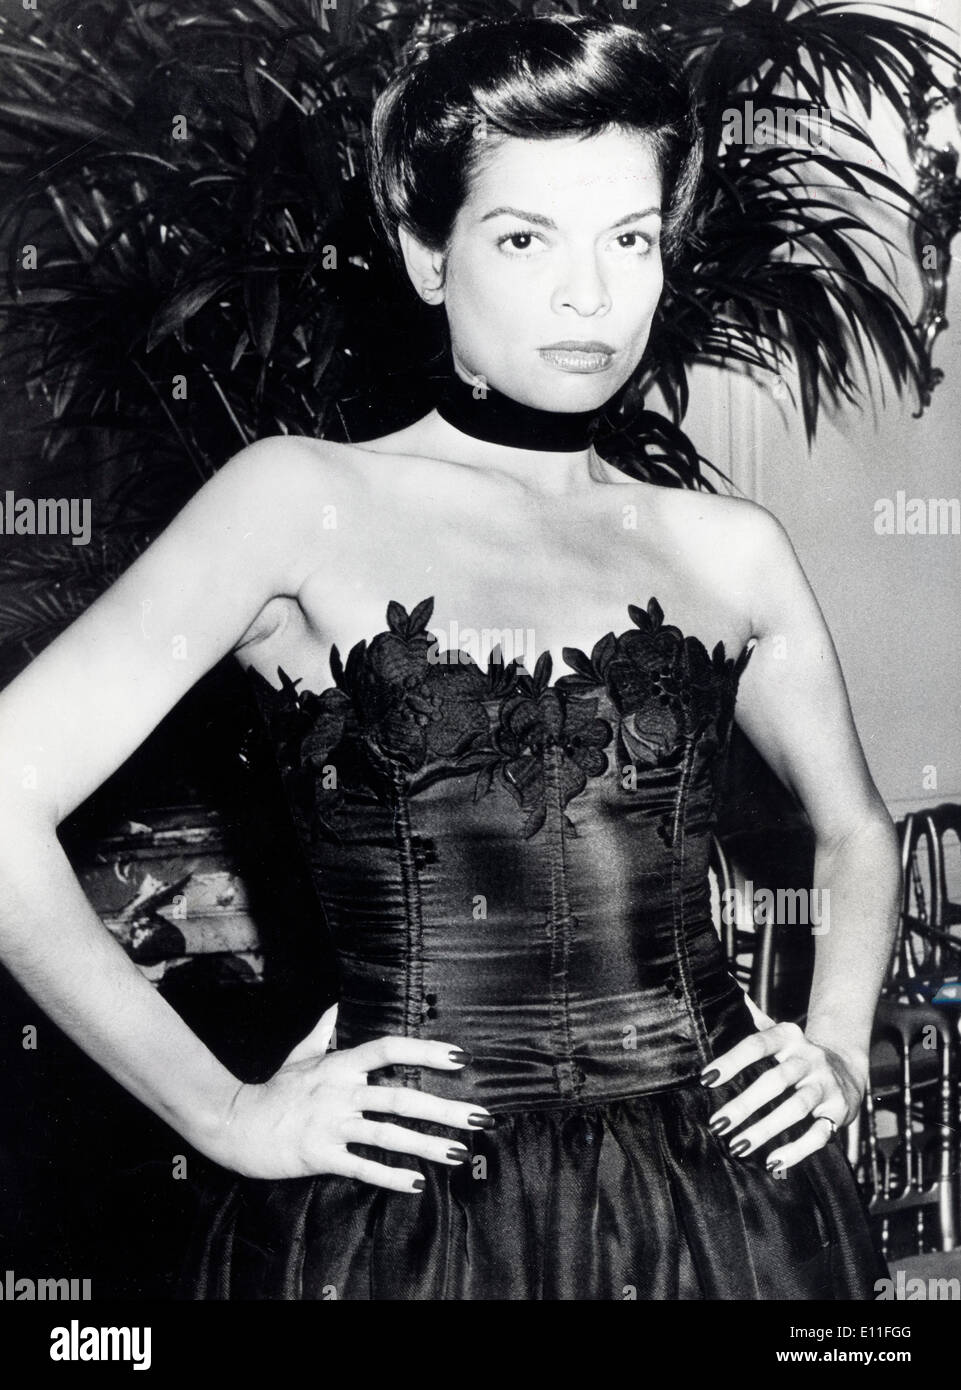 Portrait of actress model Bianca Jagger - Stock Image